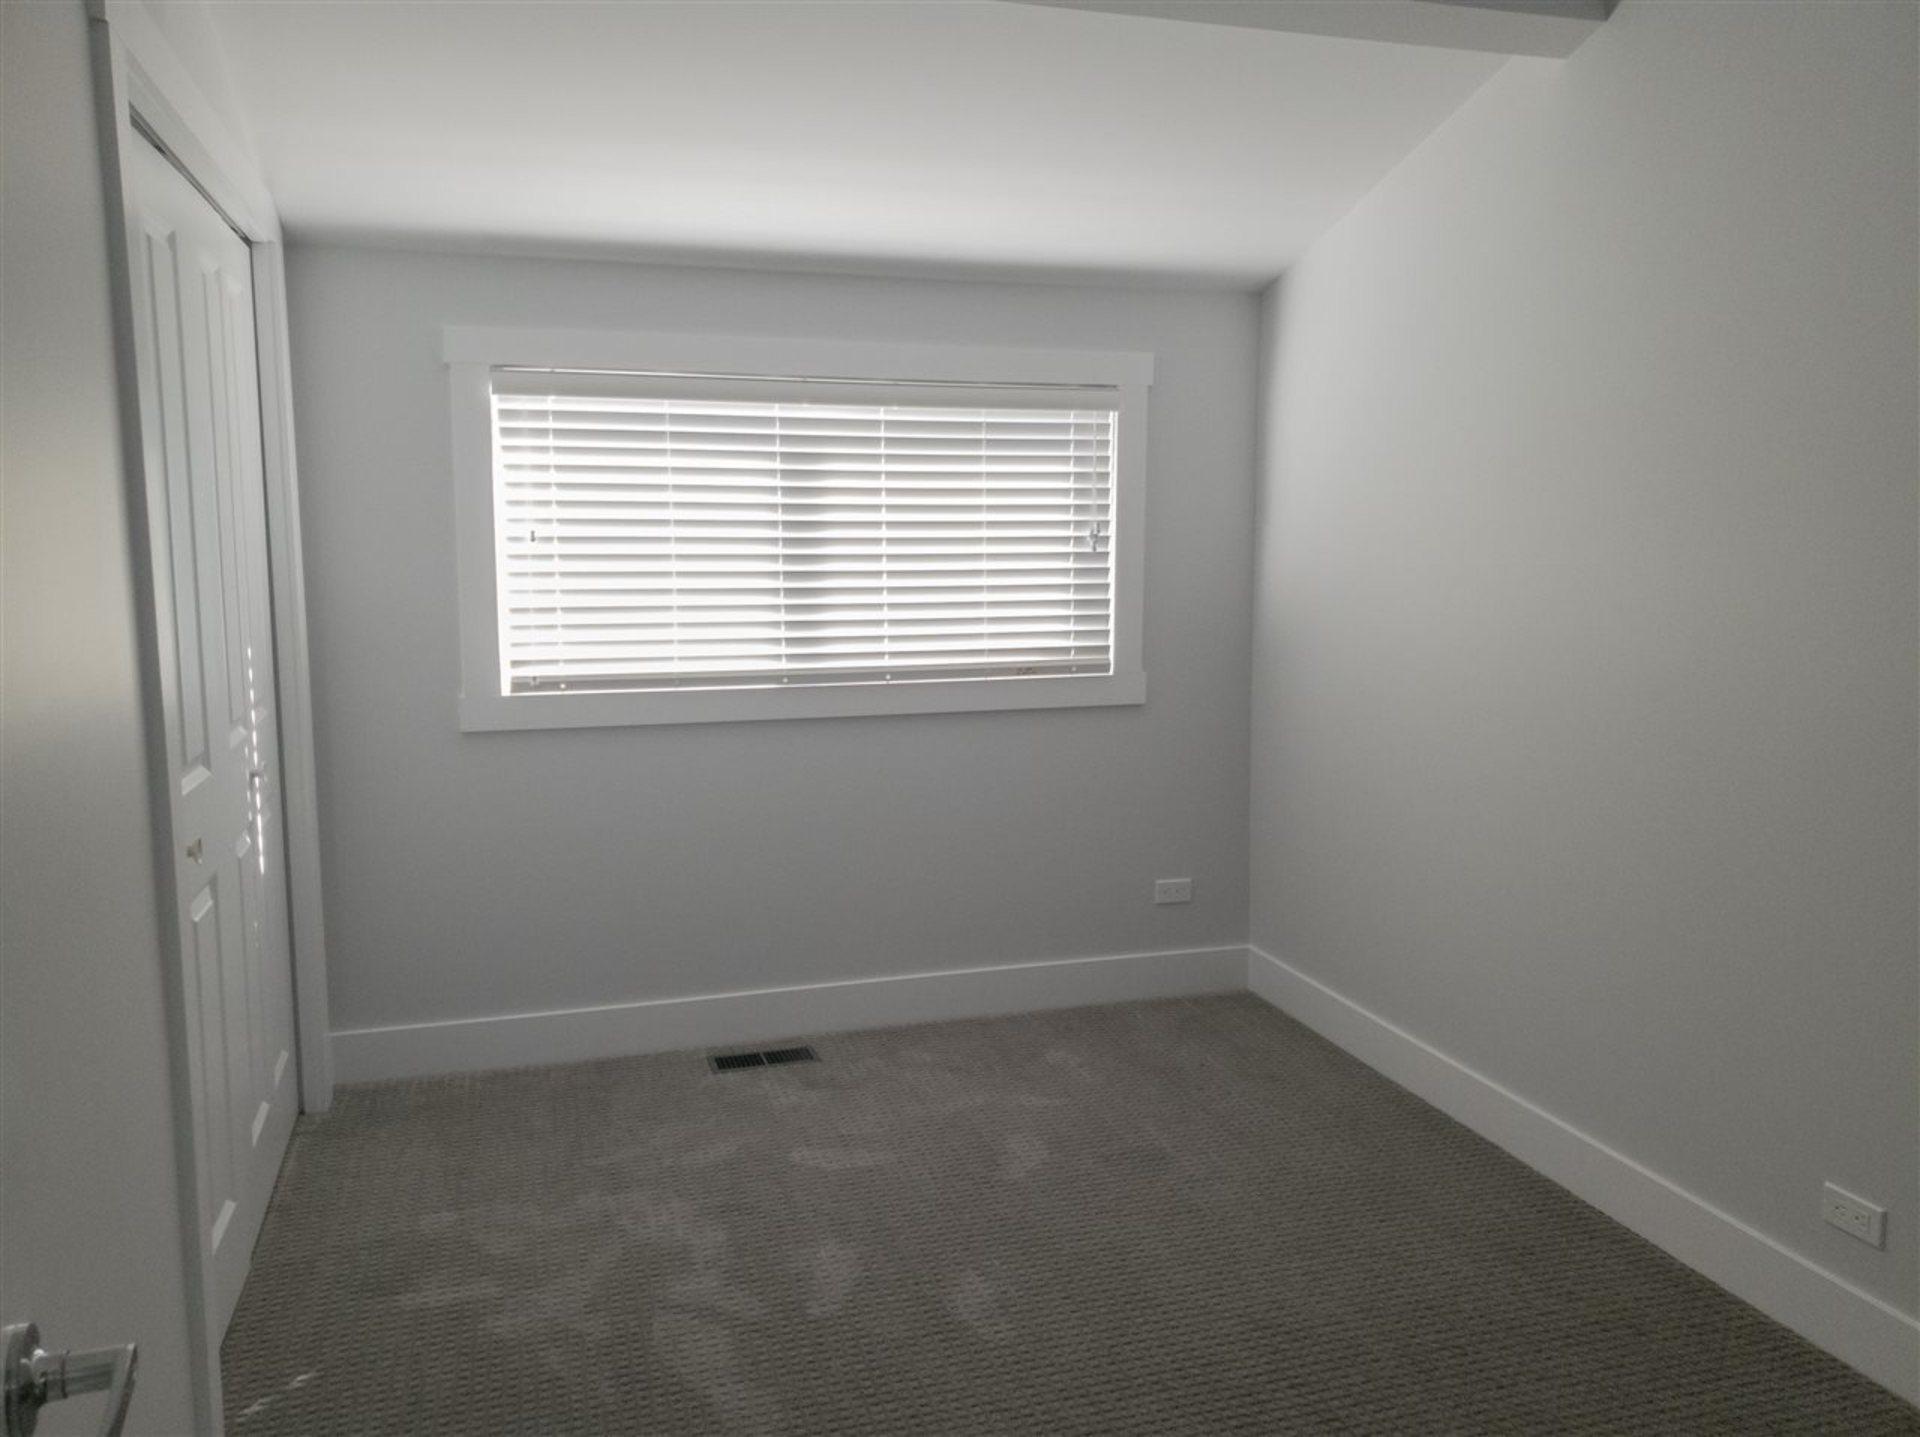 5770-185-street-cloverdale-bc-cloverdale-10 at 5770 185 Street, Cloverdale BC, Cloverdale